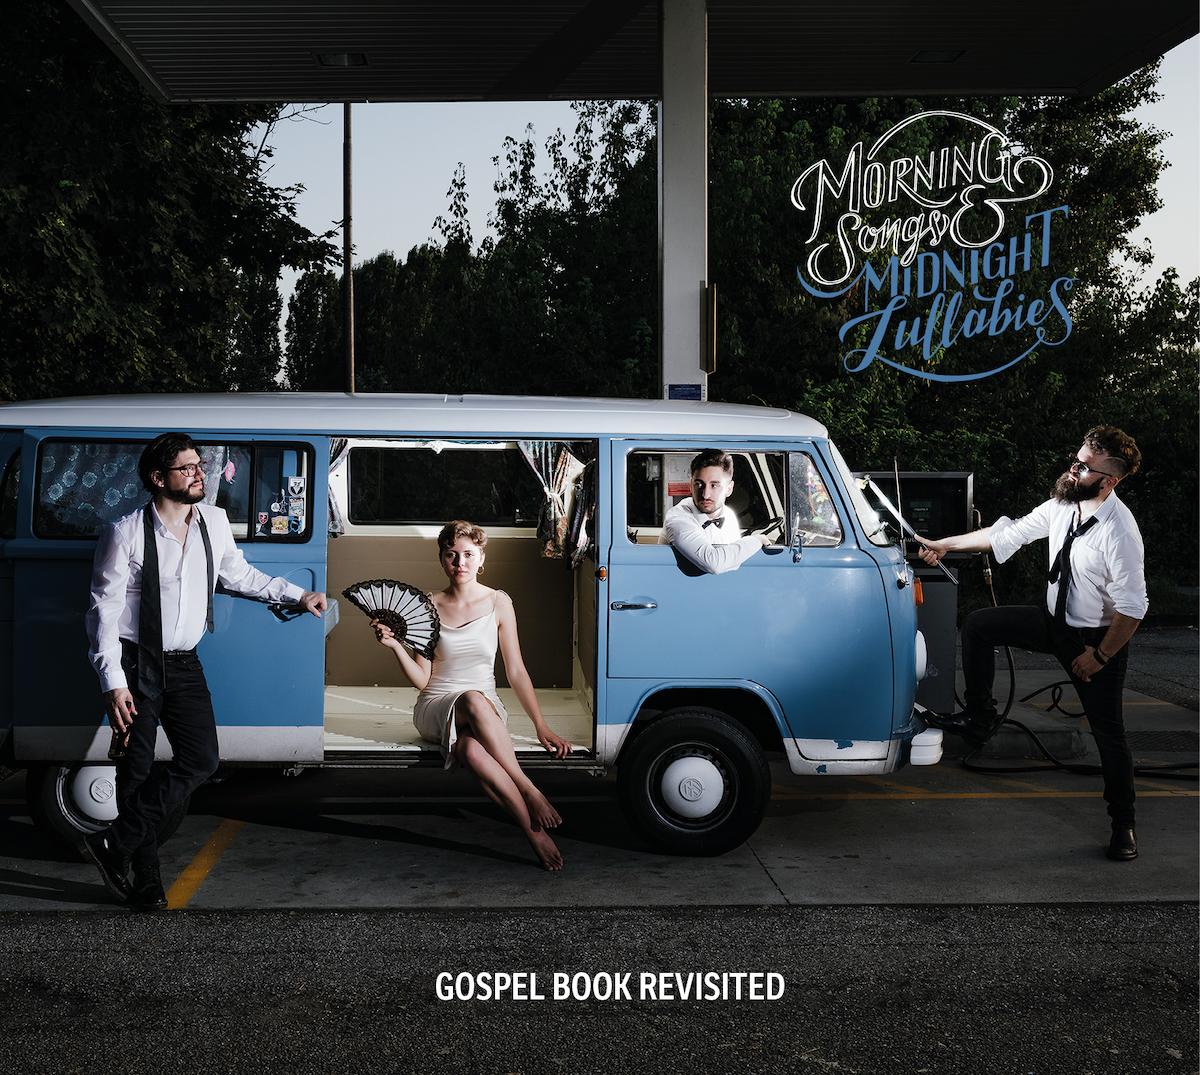 gospel-book-revisited-morning-songs-midnight-lullabies-cover.jpg